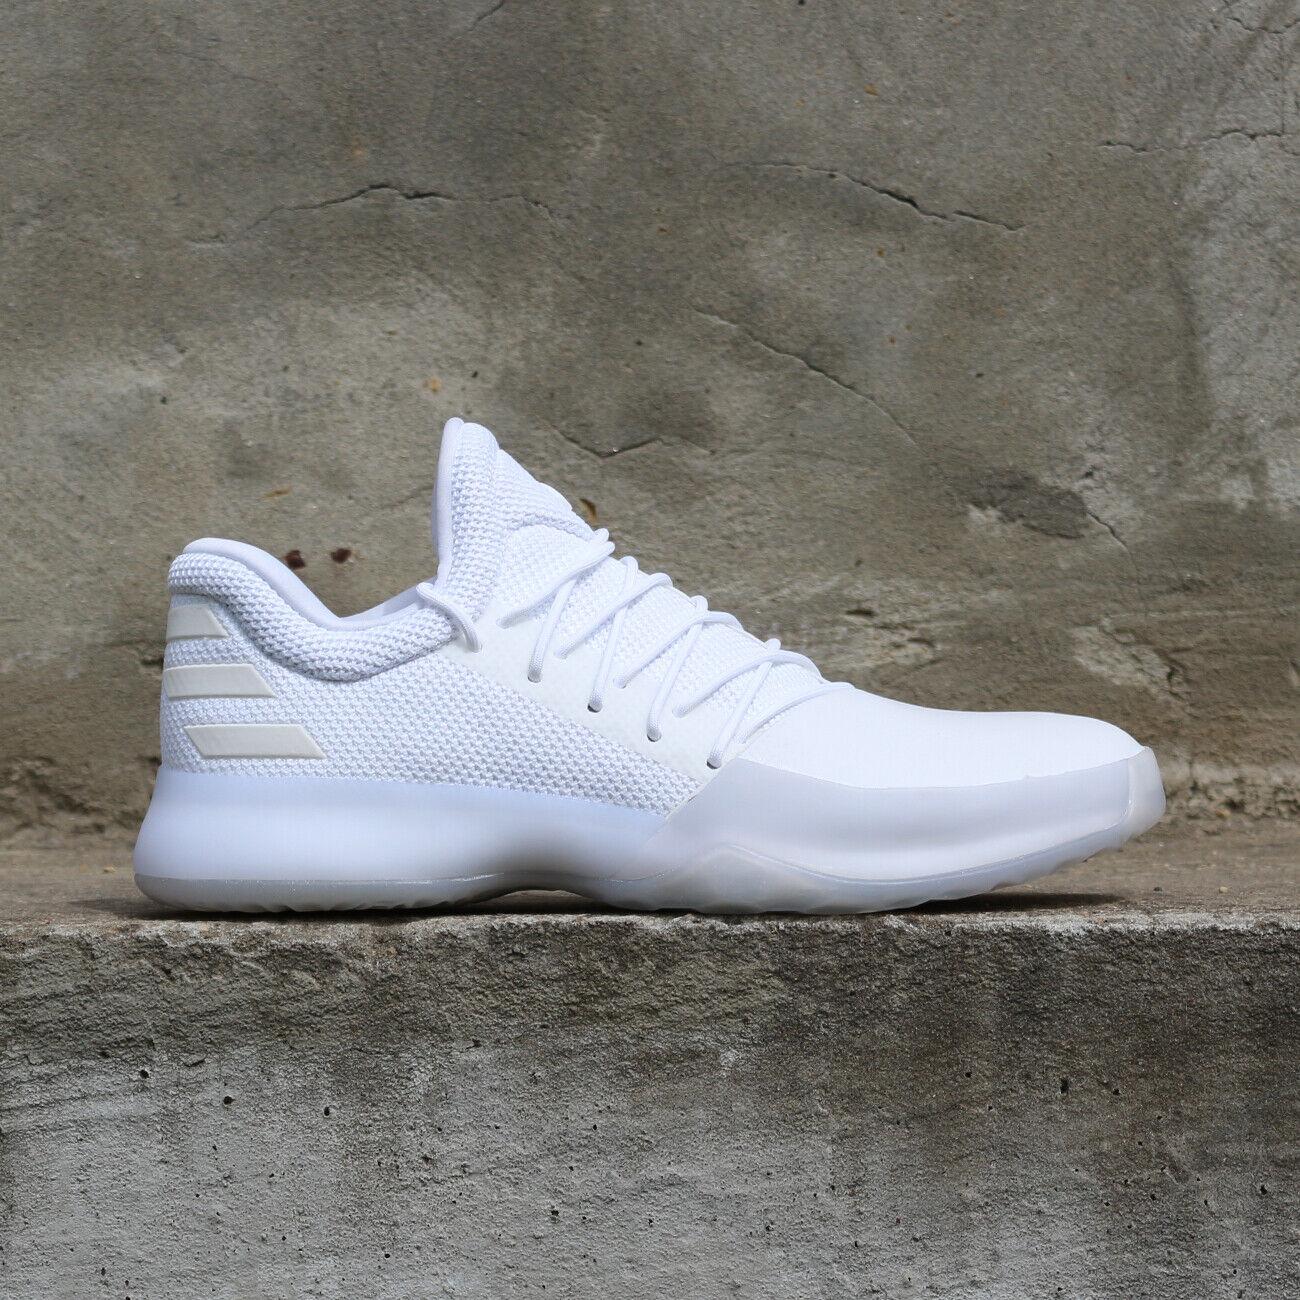 Adidas Harden Vol. 1 BY4525 Yacht Club Fiesta blancoo cohetes baloncesto Triple All